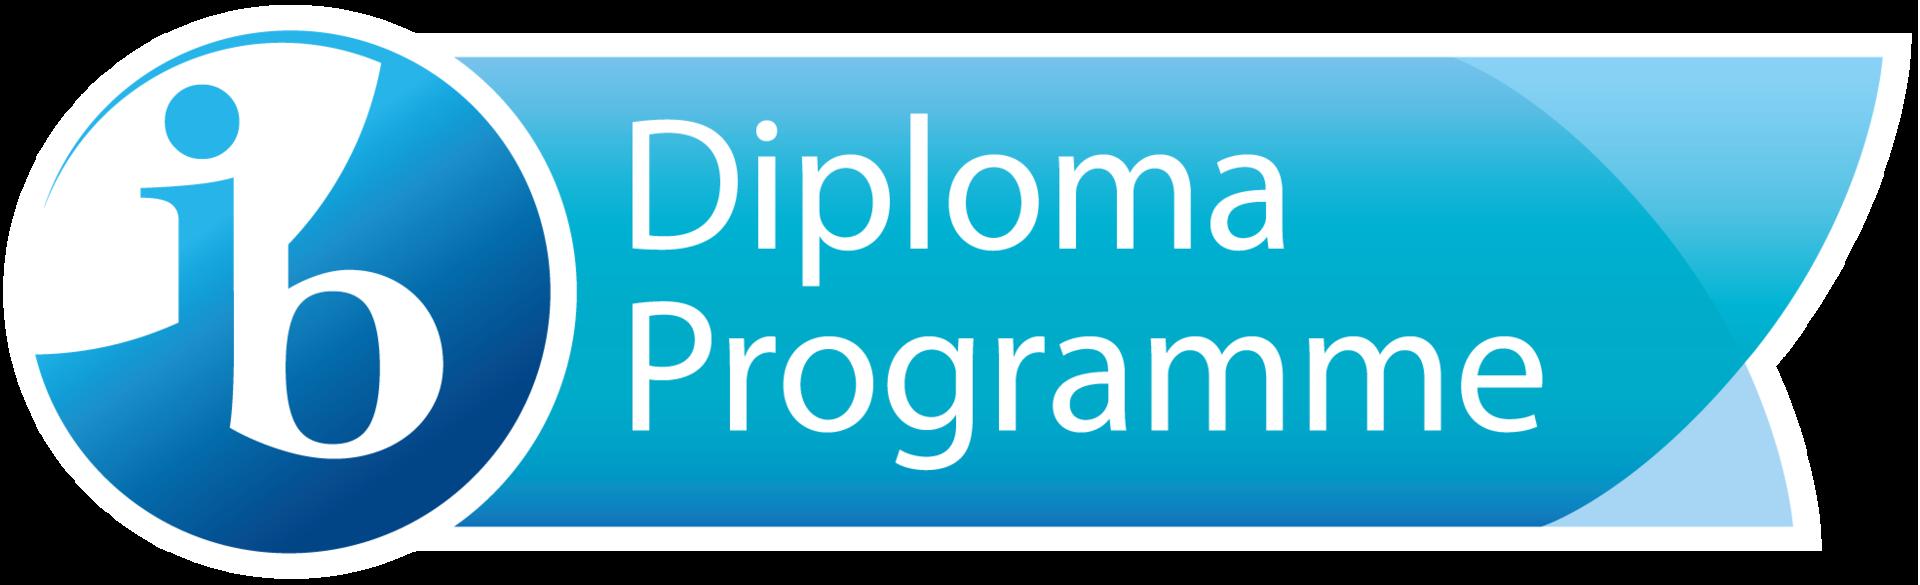 IB Program Logo.png